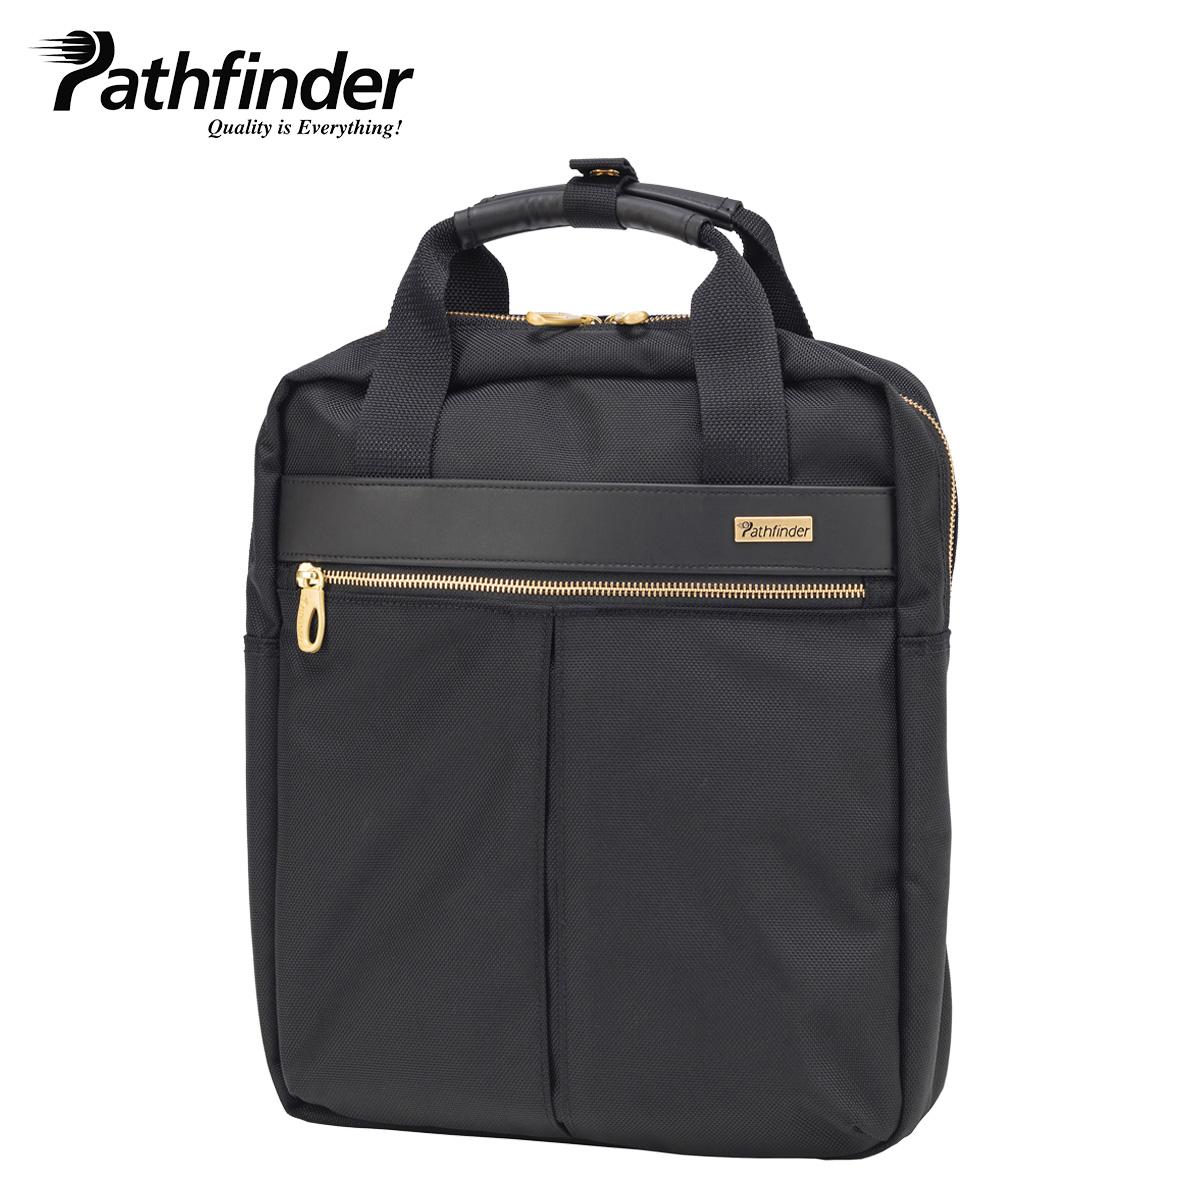 Pathfinder 2WAY AVENGER パスファインダー バッグ ビジネスバッグ リュック バックパック メンズ ブラック 黒 PF1815LB